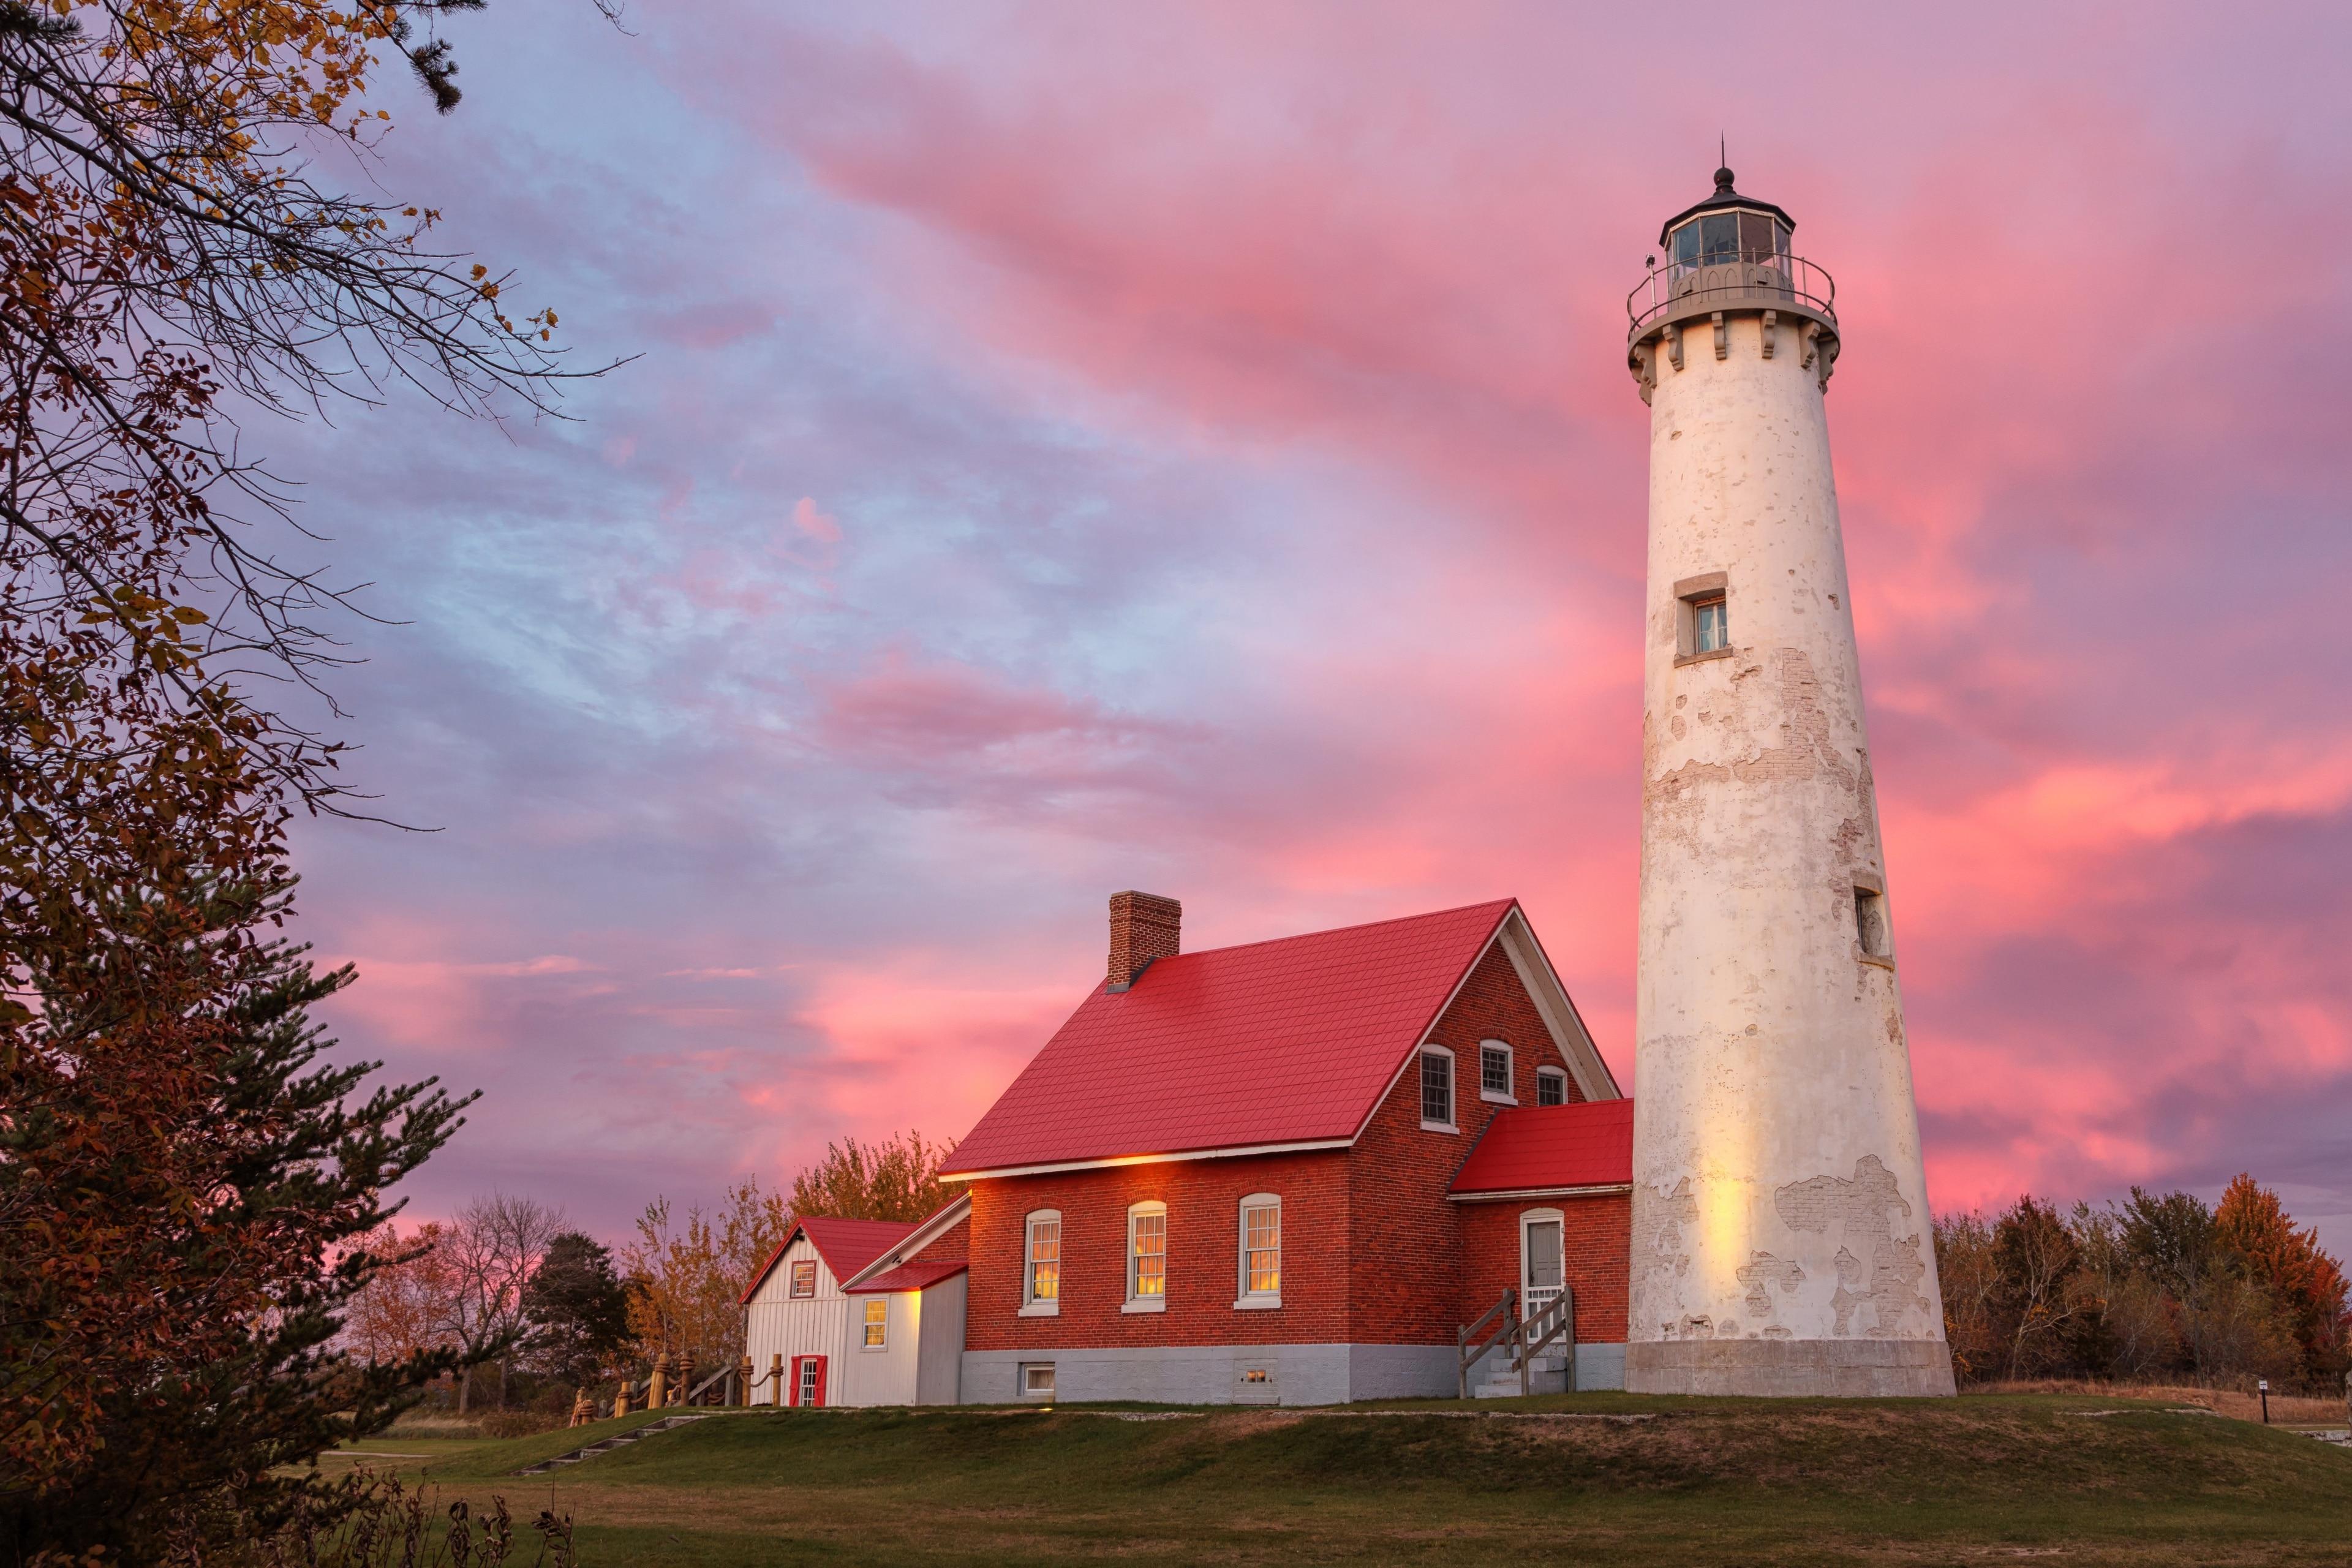 Iosco County, Michigan, United States of America